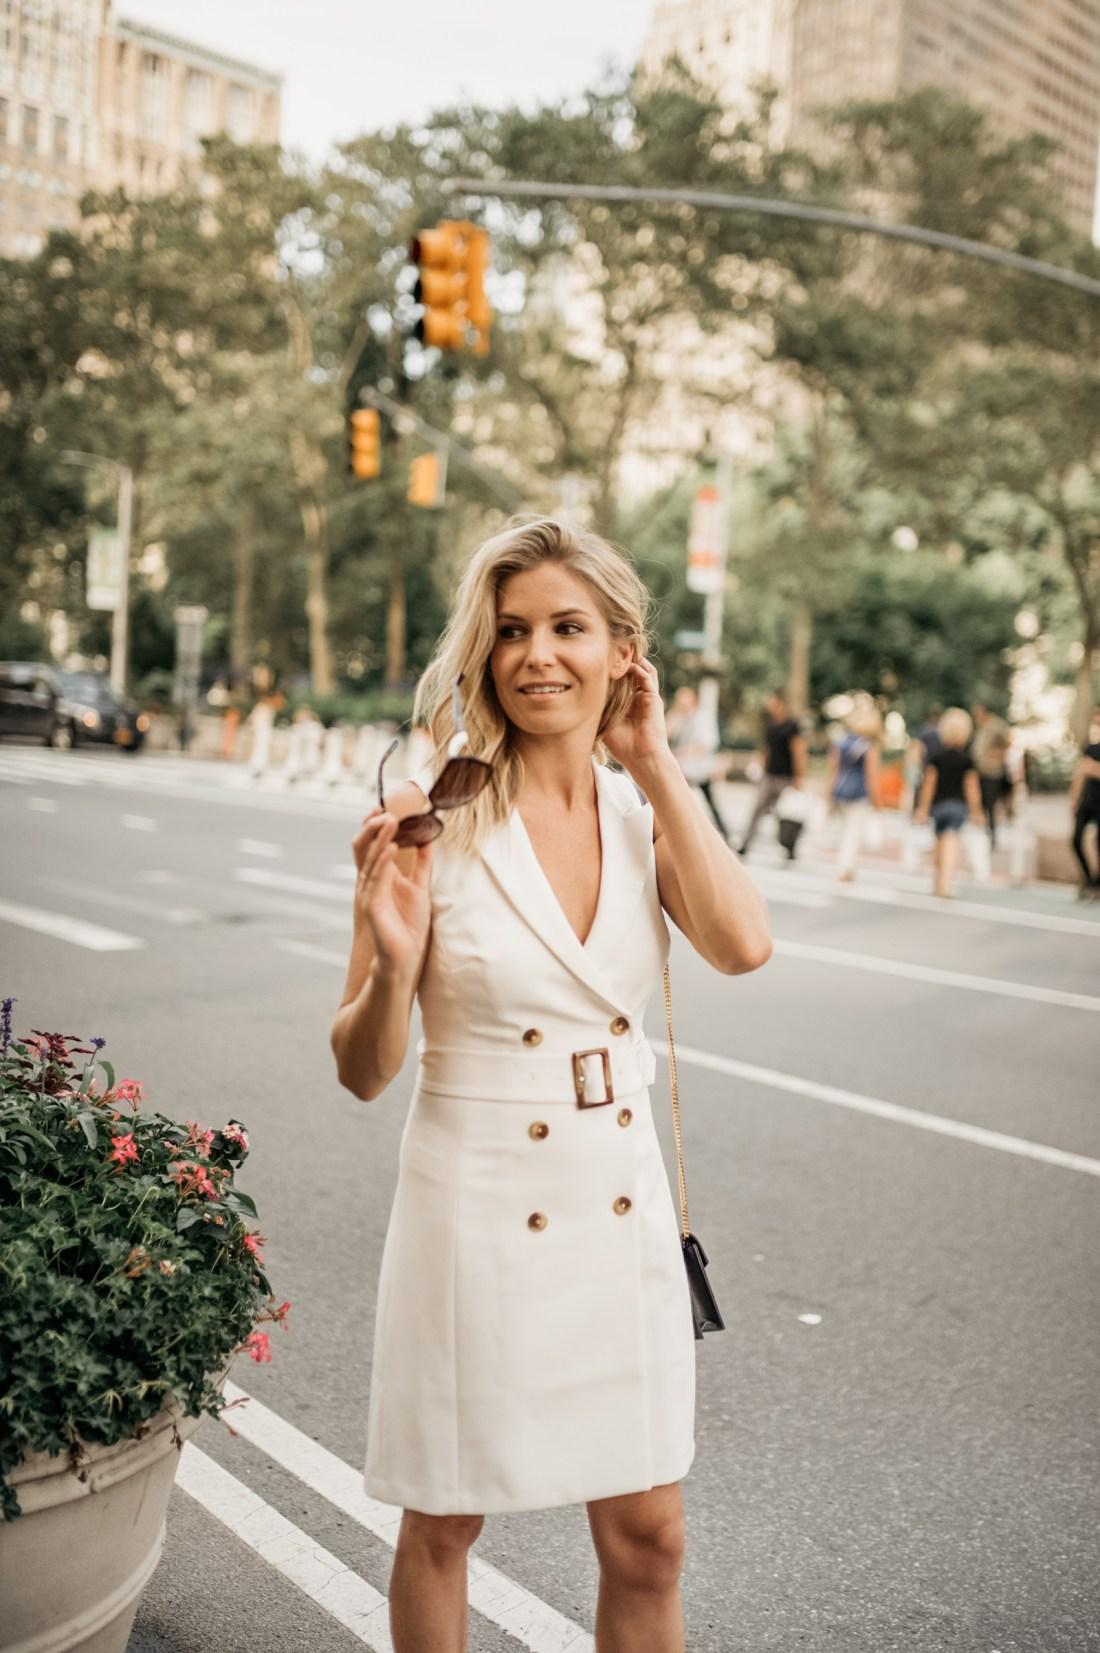 brooke burnett in a suit dress - one small blonde